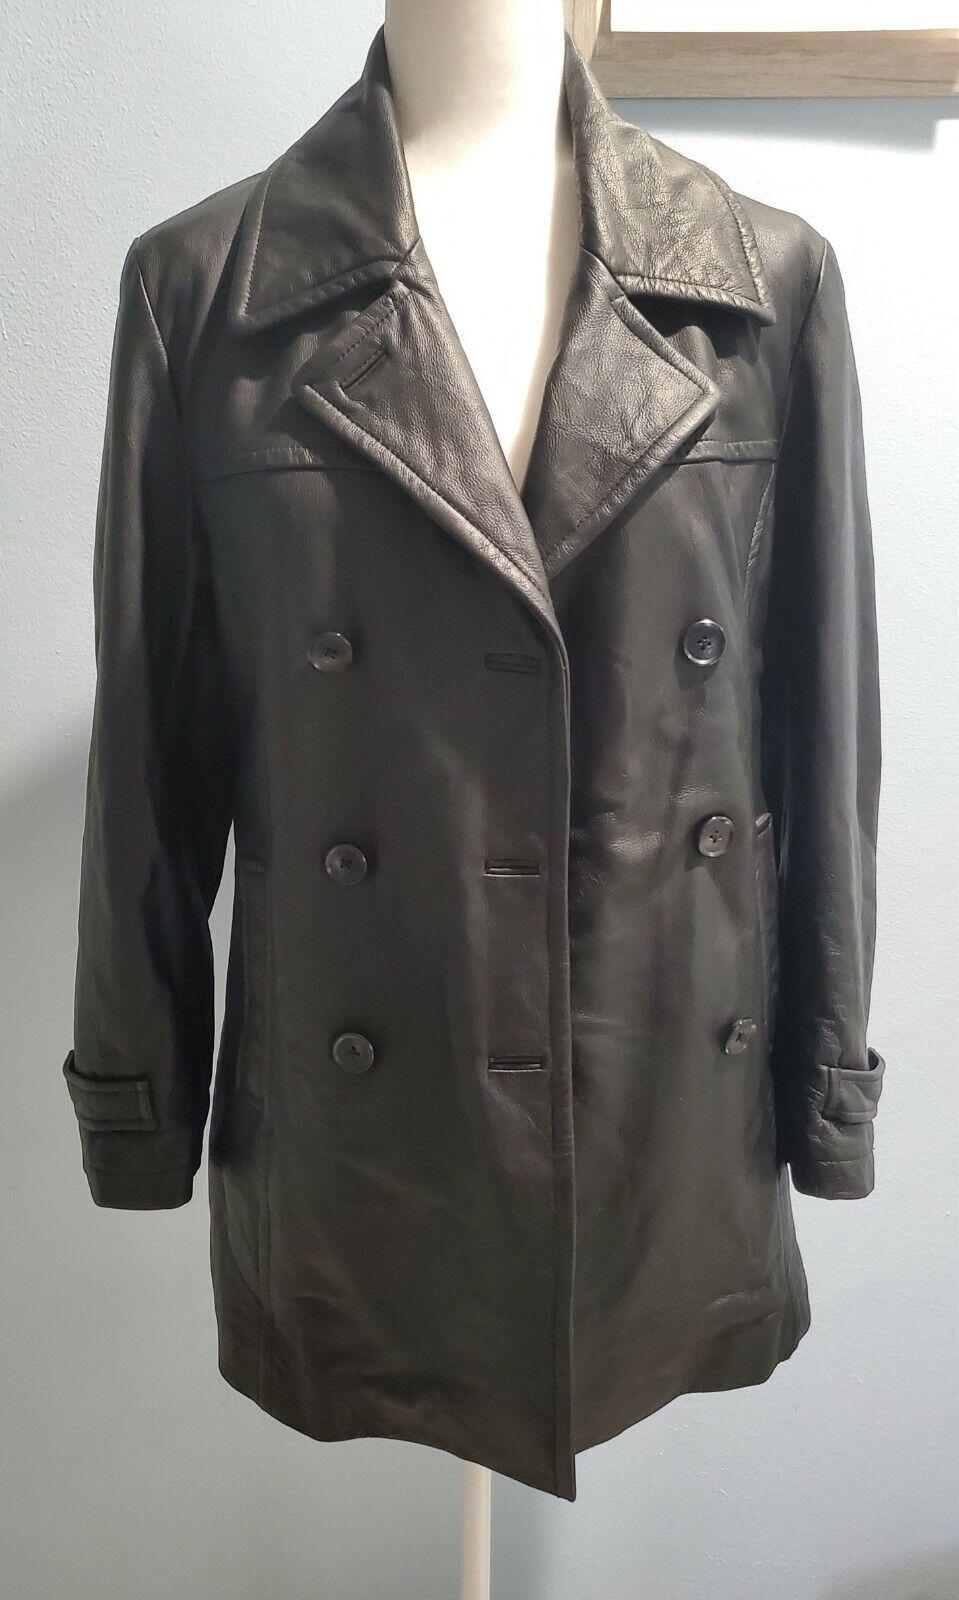 Barneys New York Women's Genuine Leather Jacket Size X-Small